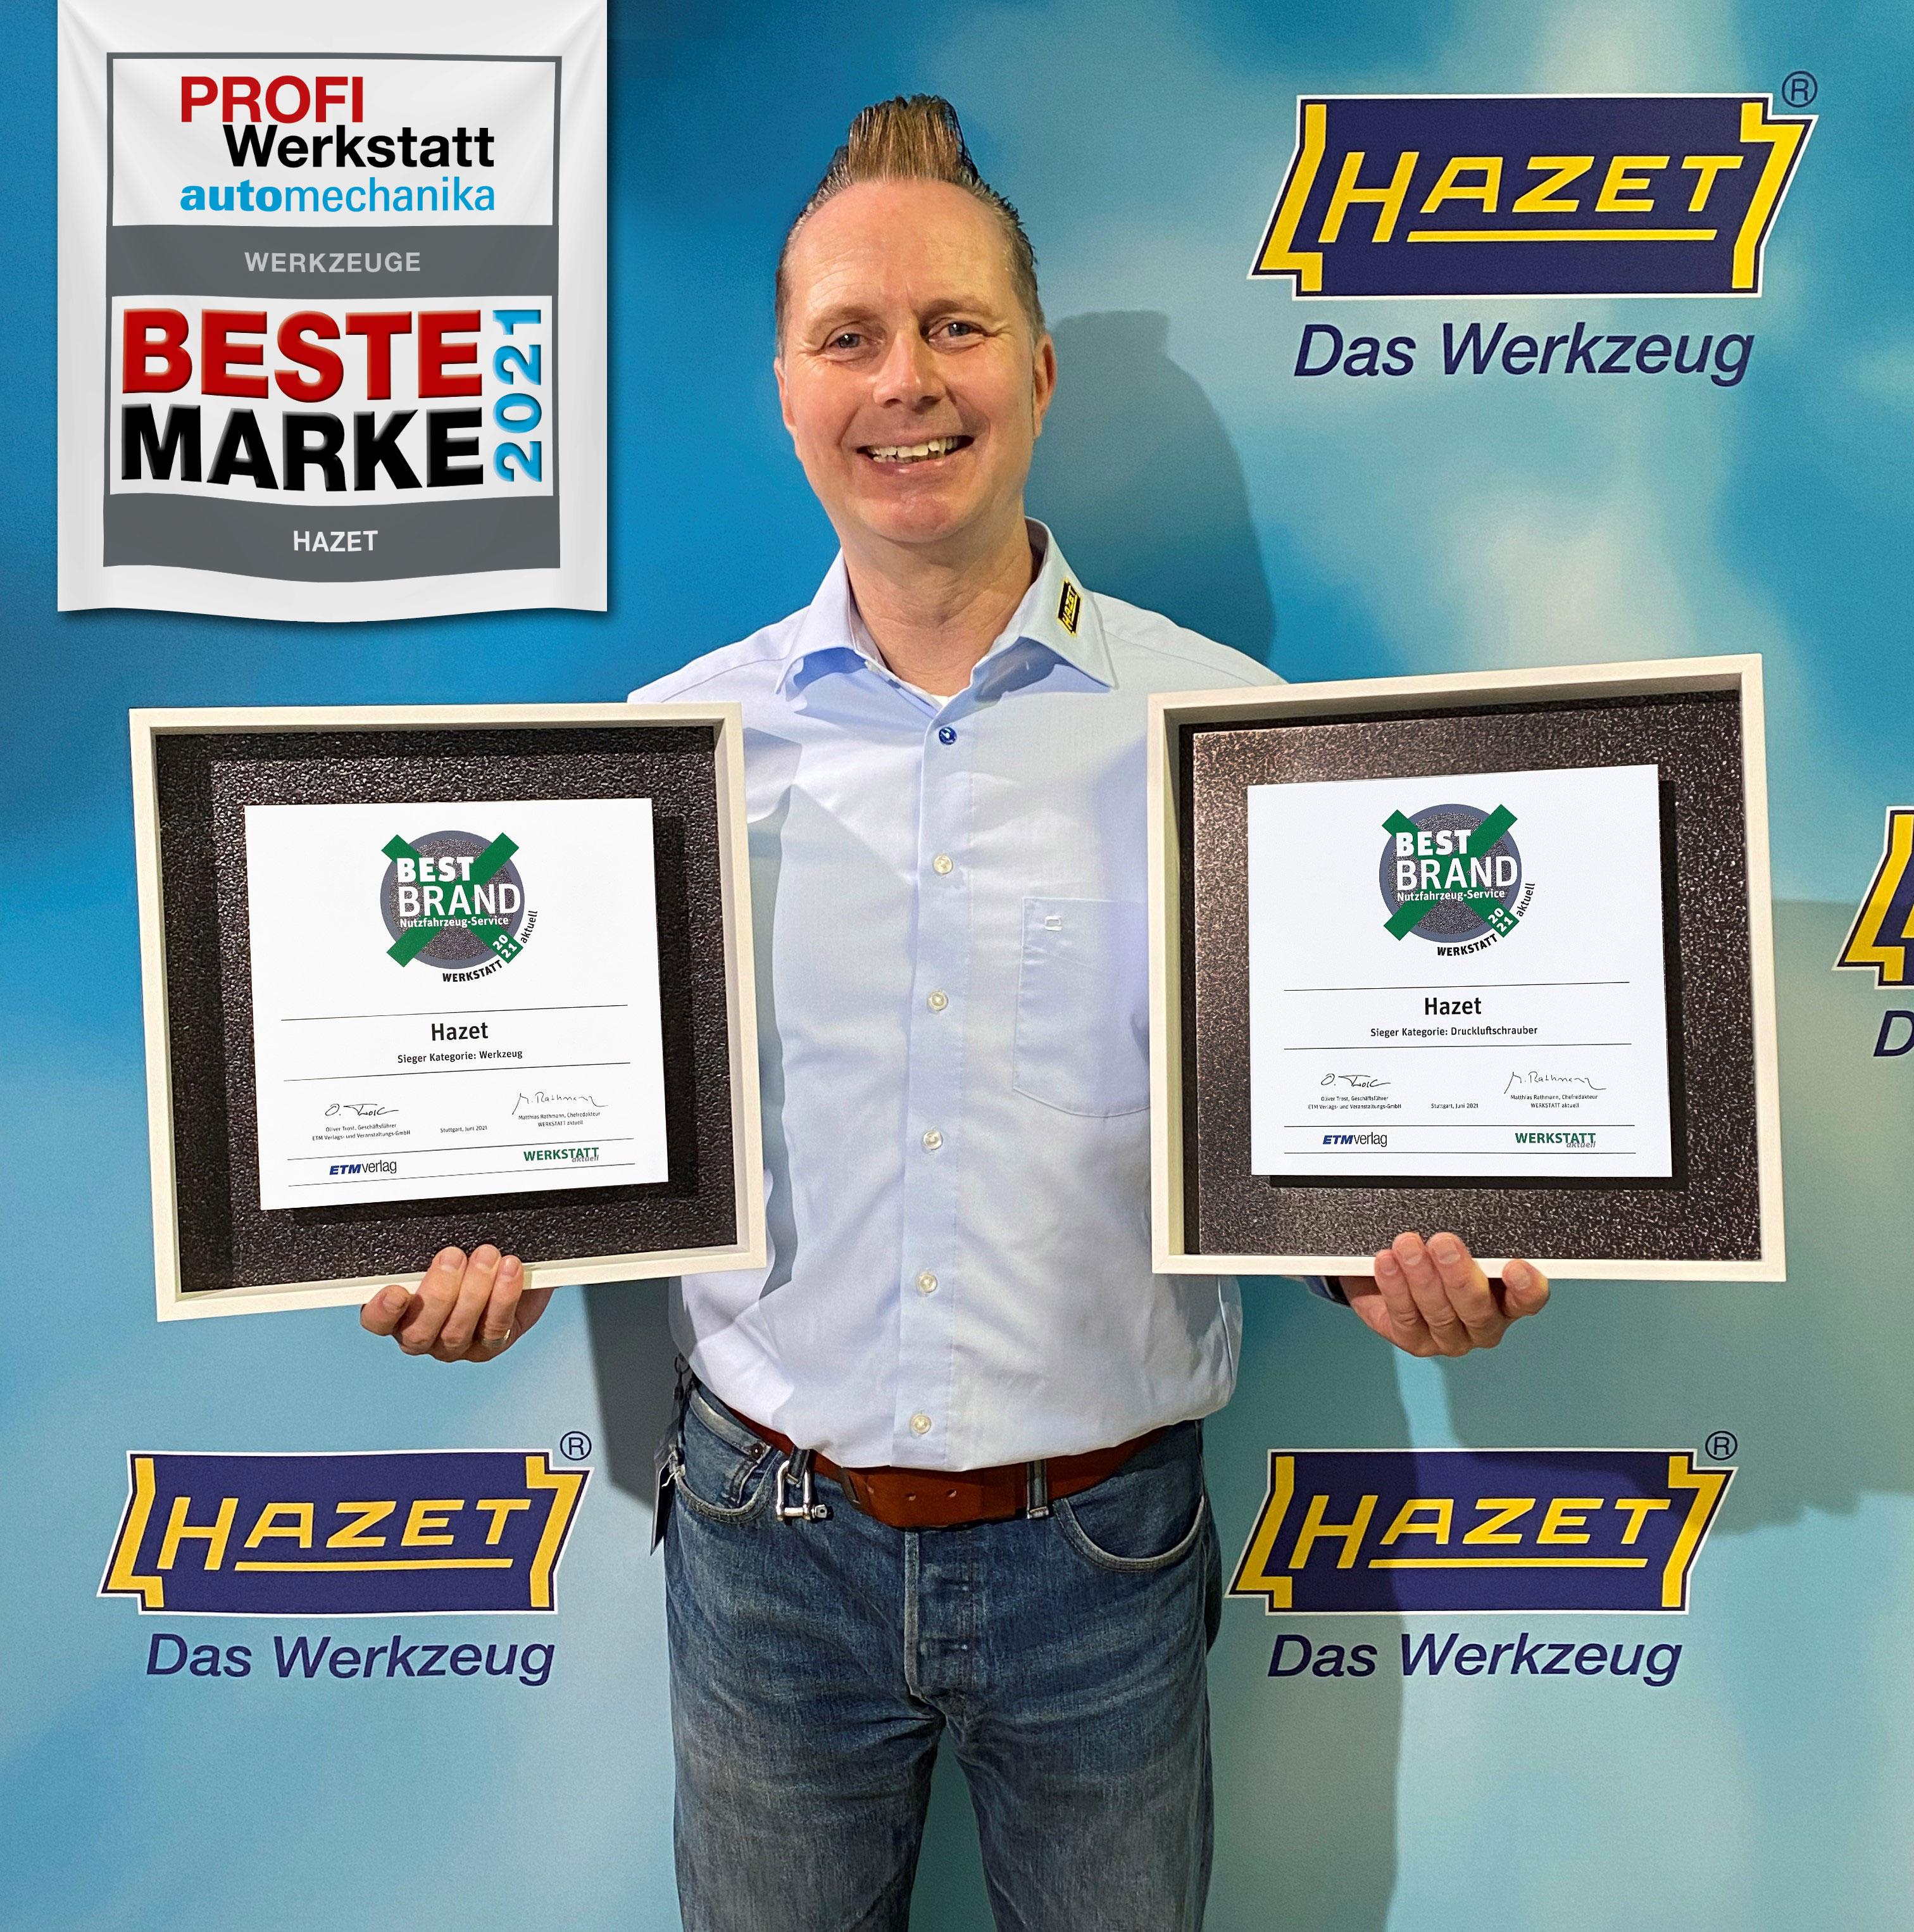 "HAZET holt sich erneut das ""Double"" bei den Nfz-Profis"